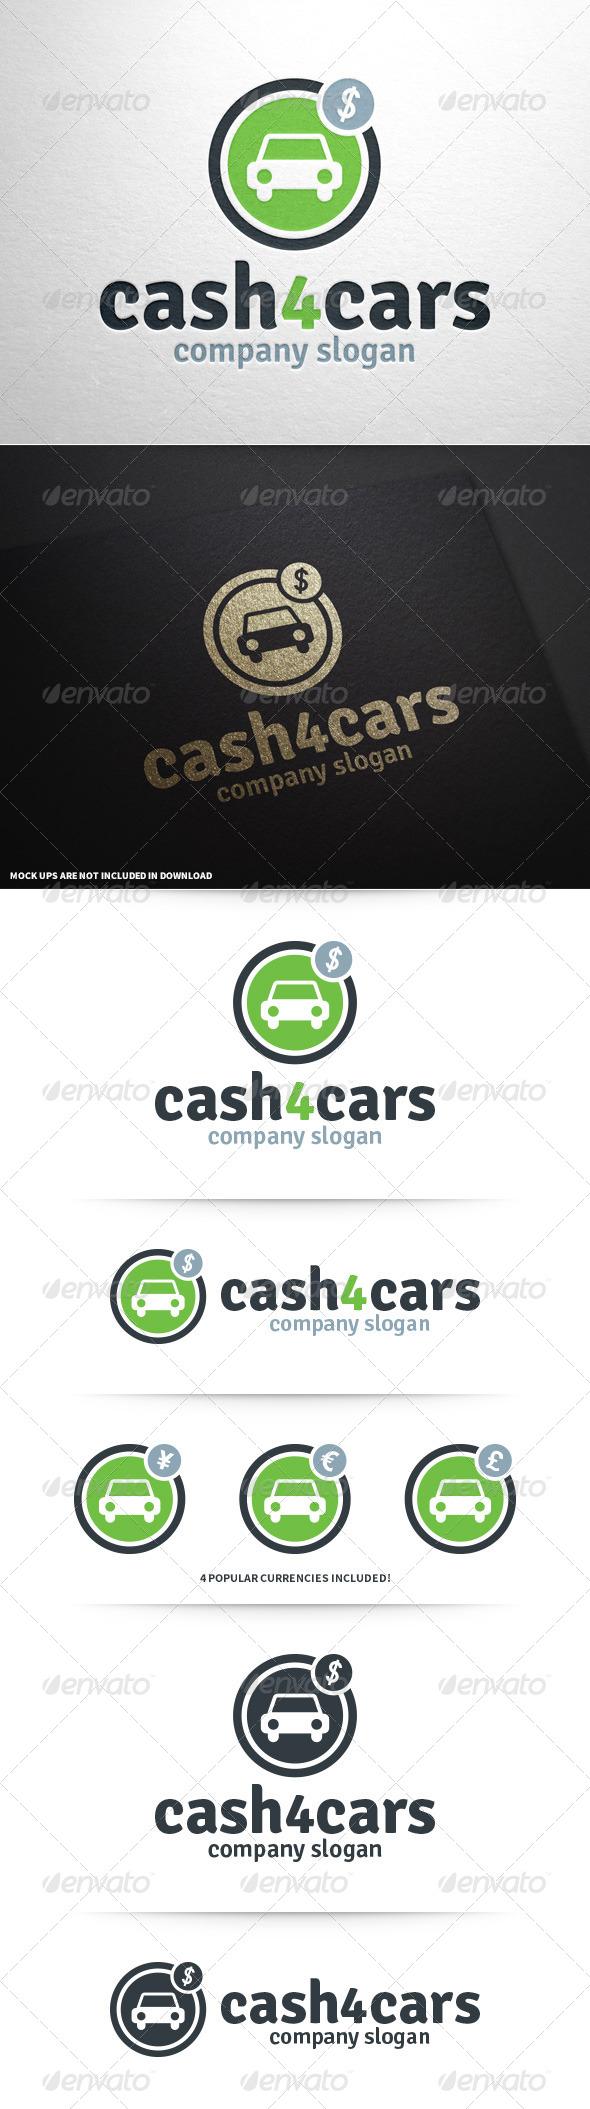 Cash 4 Cars Logo Template